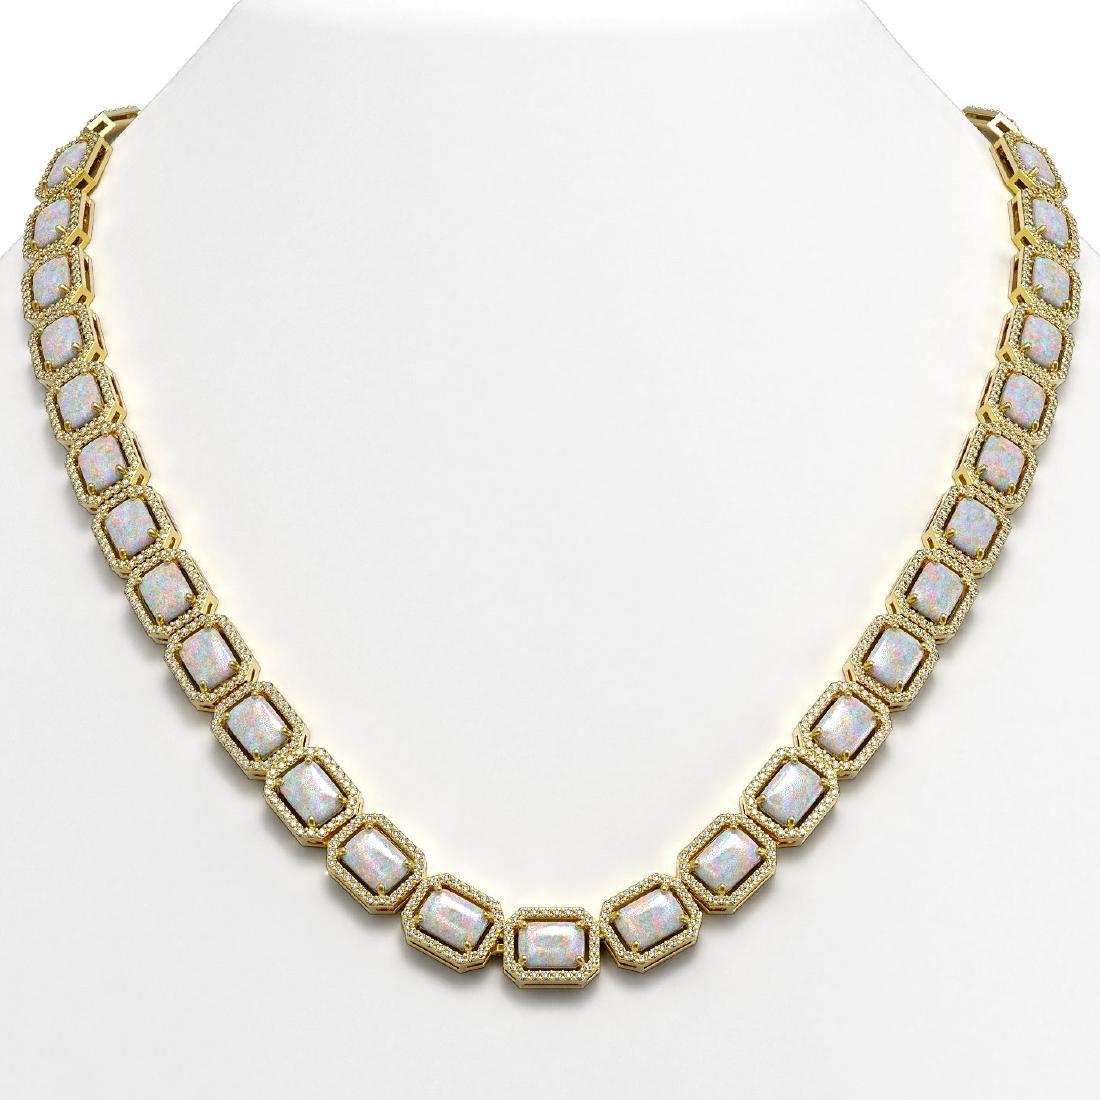 37.69 CTW Opal & Diamond Halo Necklace 10K Yellow Gold